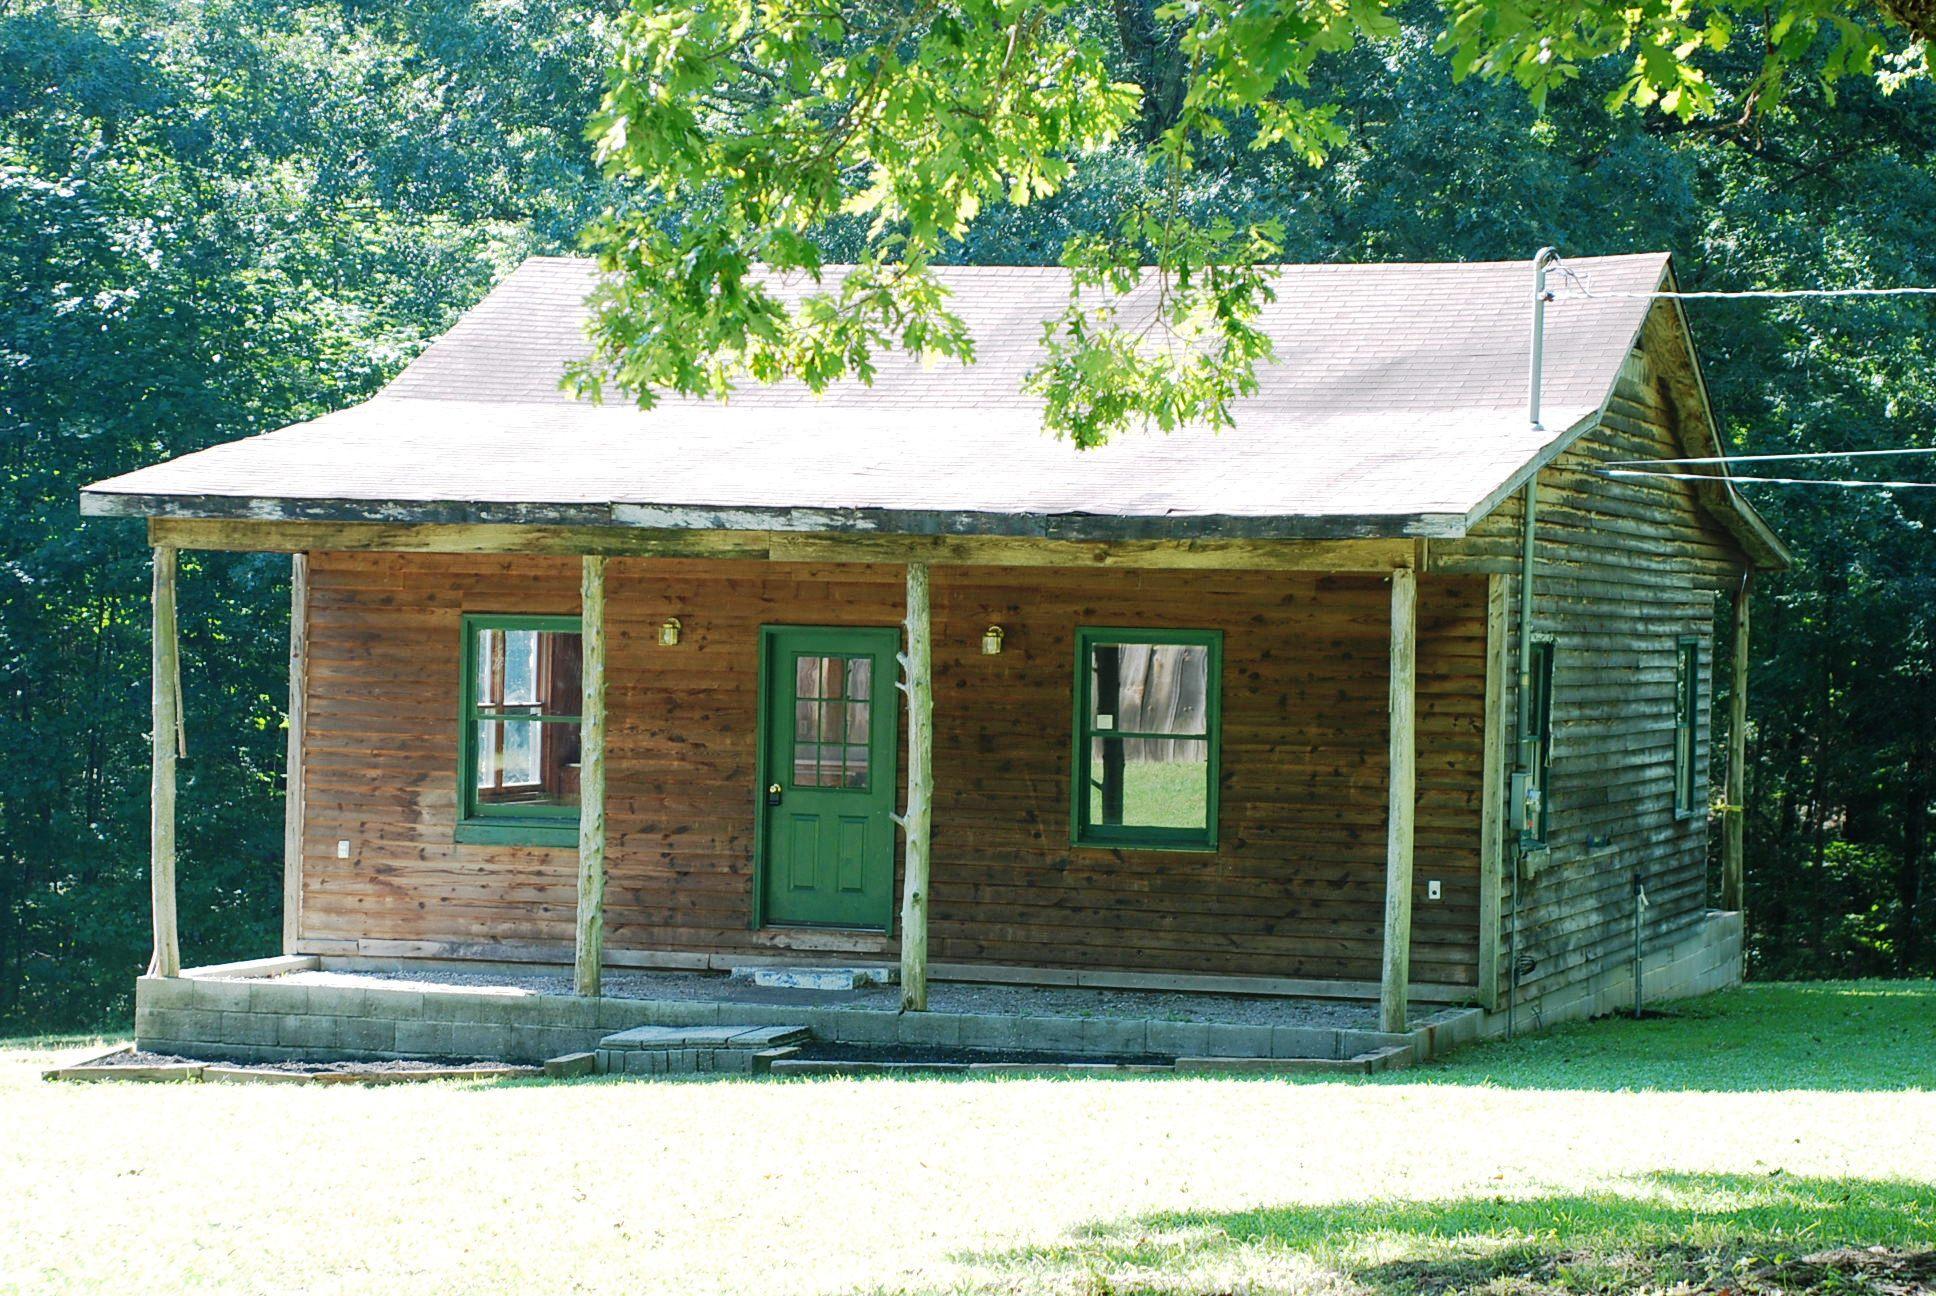 414 Tate Road, Sewanee, Tennessee 37375